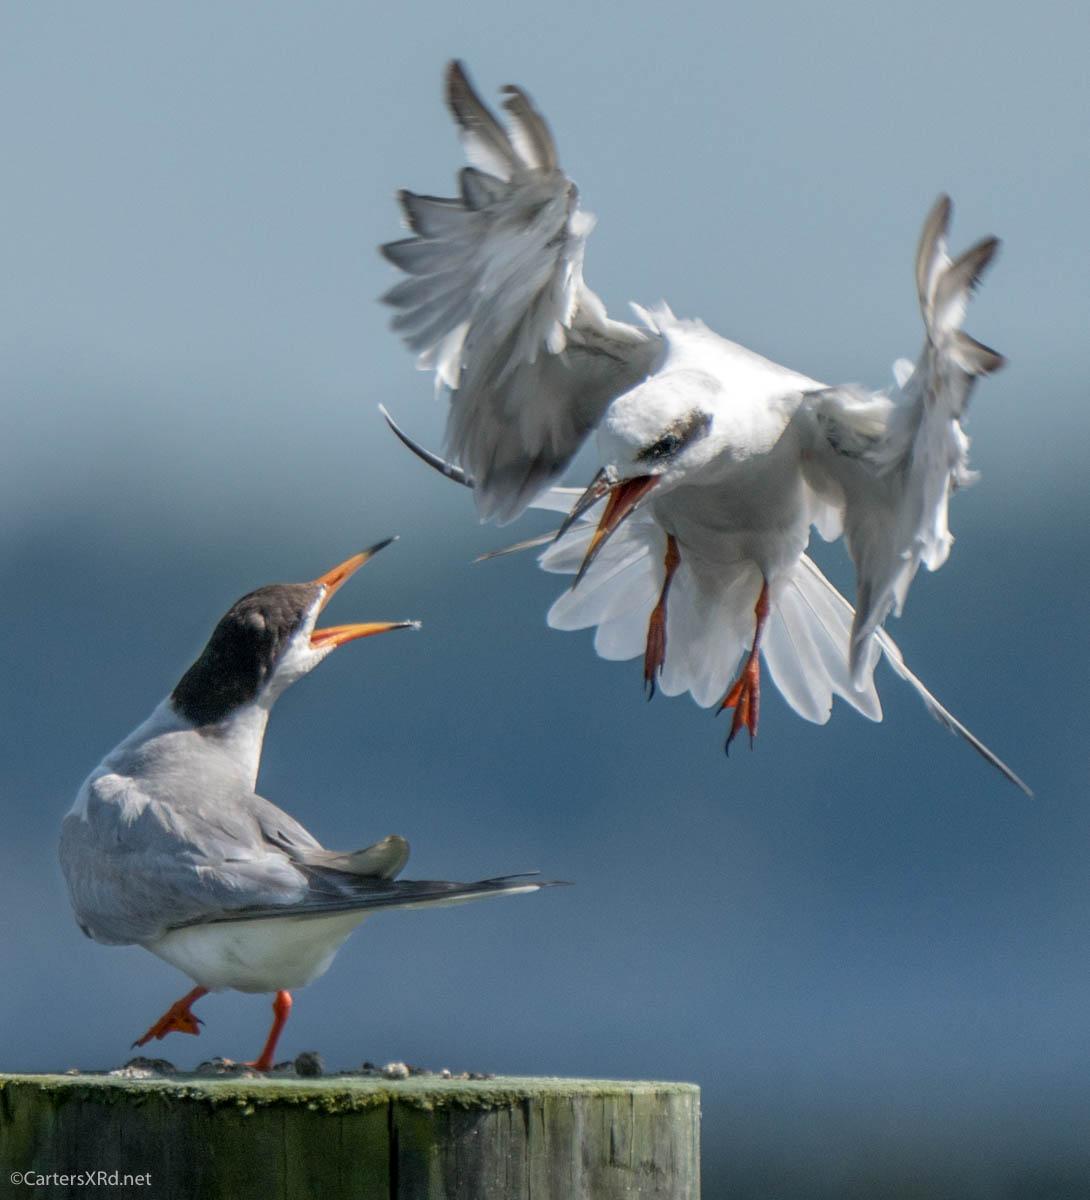 King of the Hill, Forsters Terns, Belhaven NC, Thursday #birdwatching #birds #birdphotography #birding #birdsofinstagram #NaturePhotography #NaturalBeauty #naturelover https://t.co/6em16ovJ0W